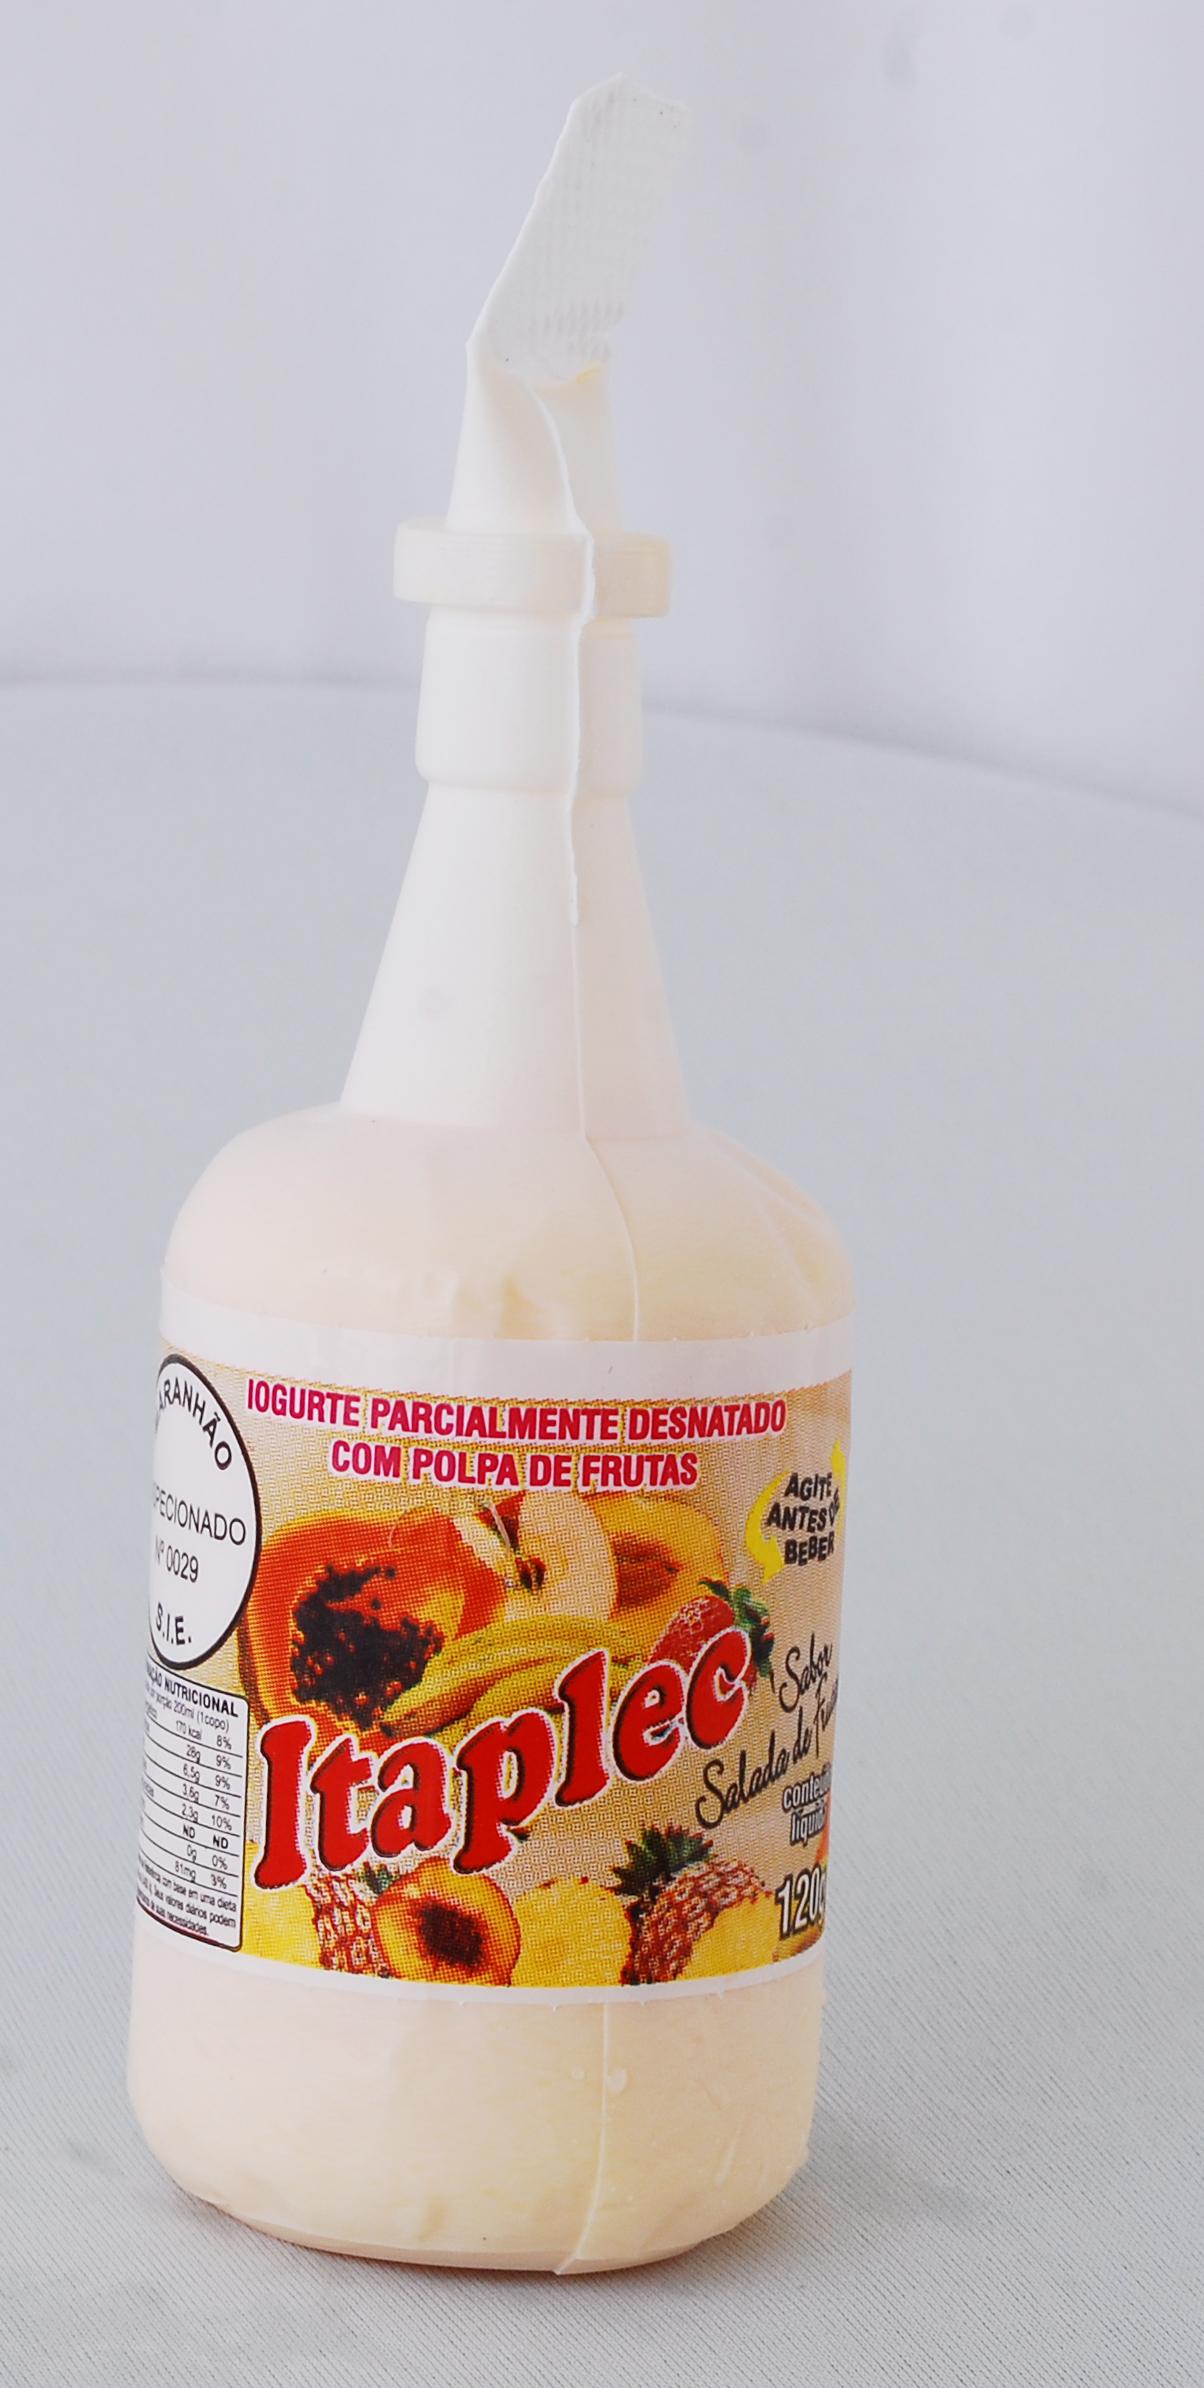 Iogurte Semi-desnatado Sabor Salada de fruta